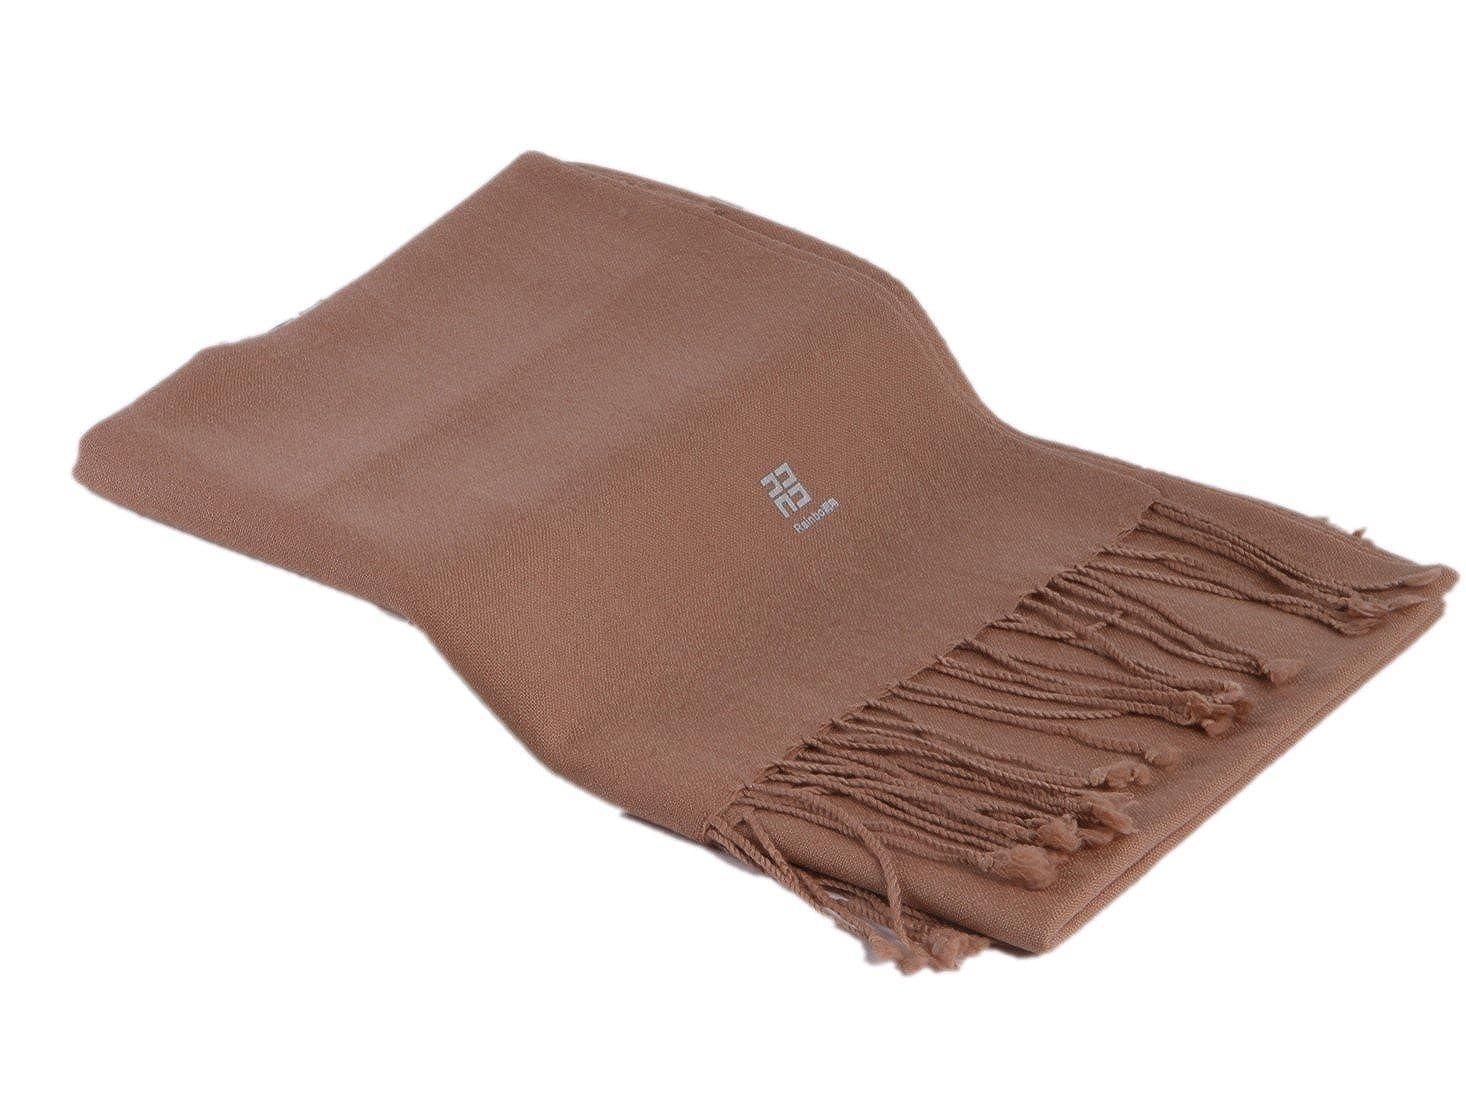 TALLA 230 cm x 80 cm, chaise franges, 130g. Prettystern- pashmina chal de 230cm de largo 100% hilado de lanas 80 monocromas franjas de color liso - selección de color